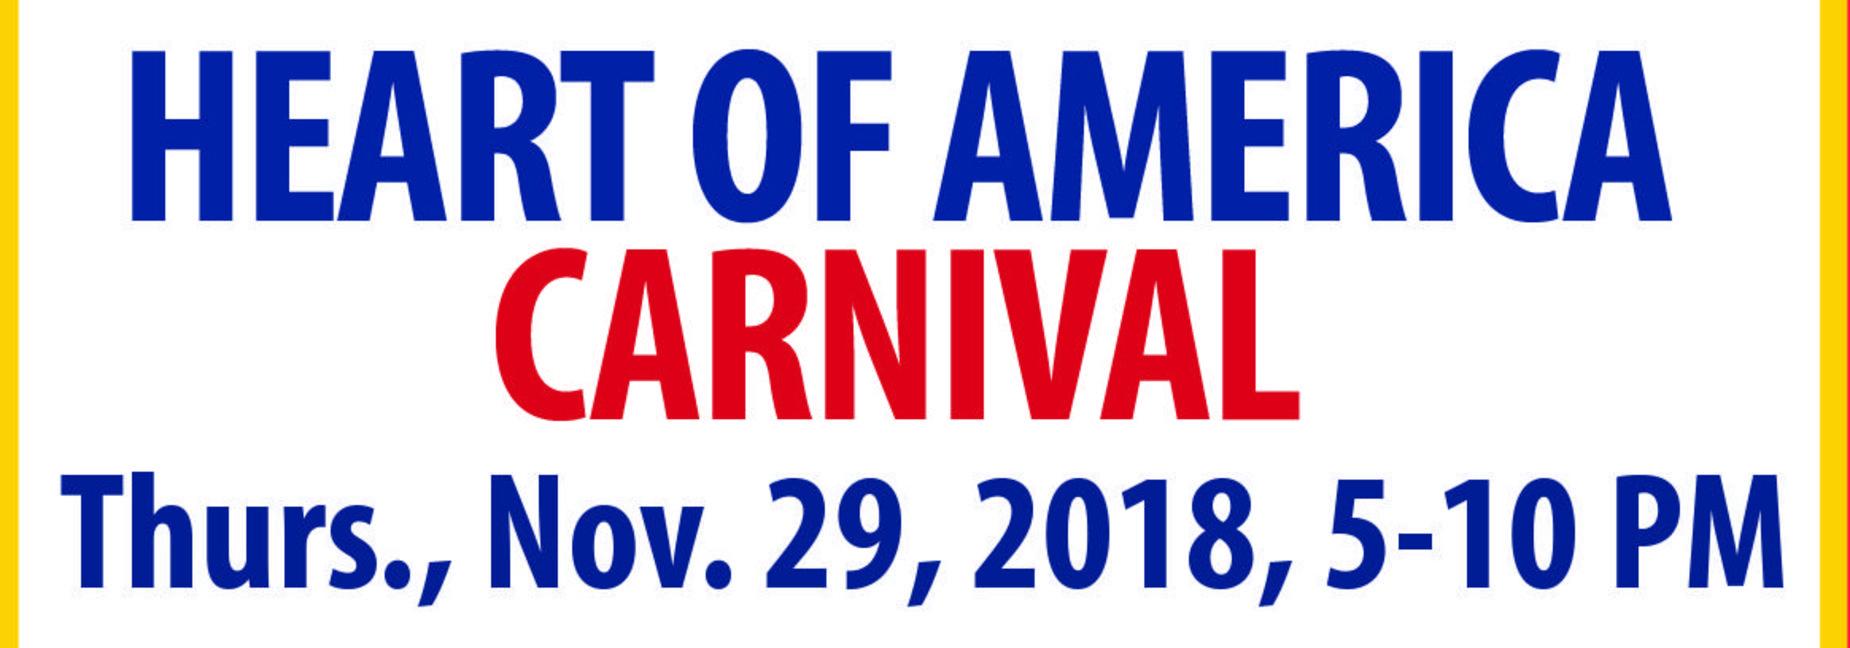 Heart of America Carnival